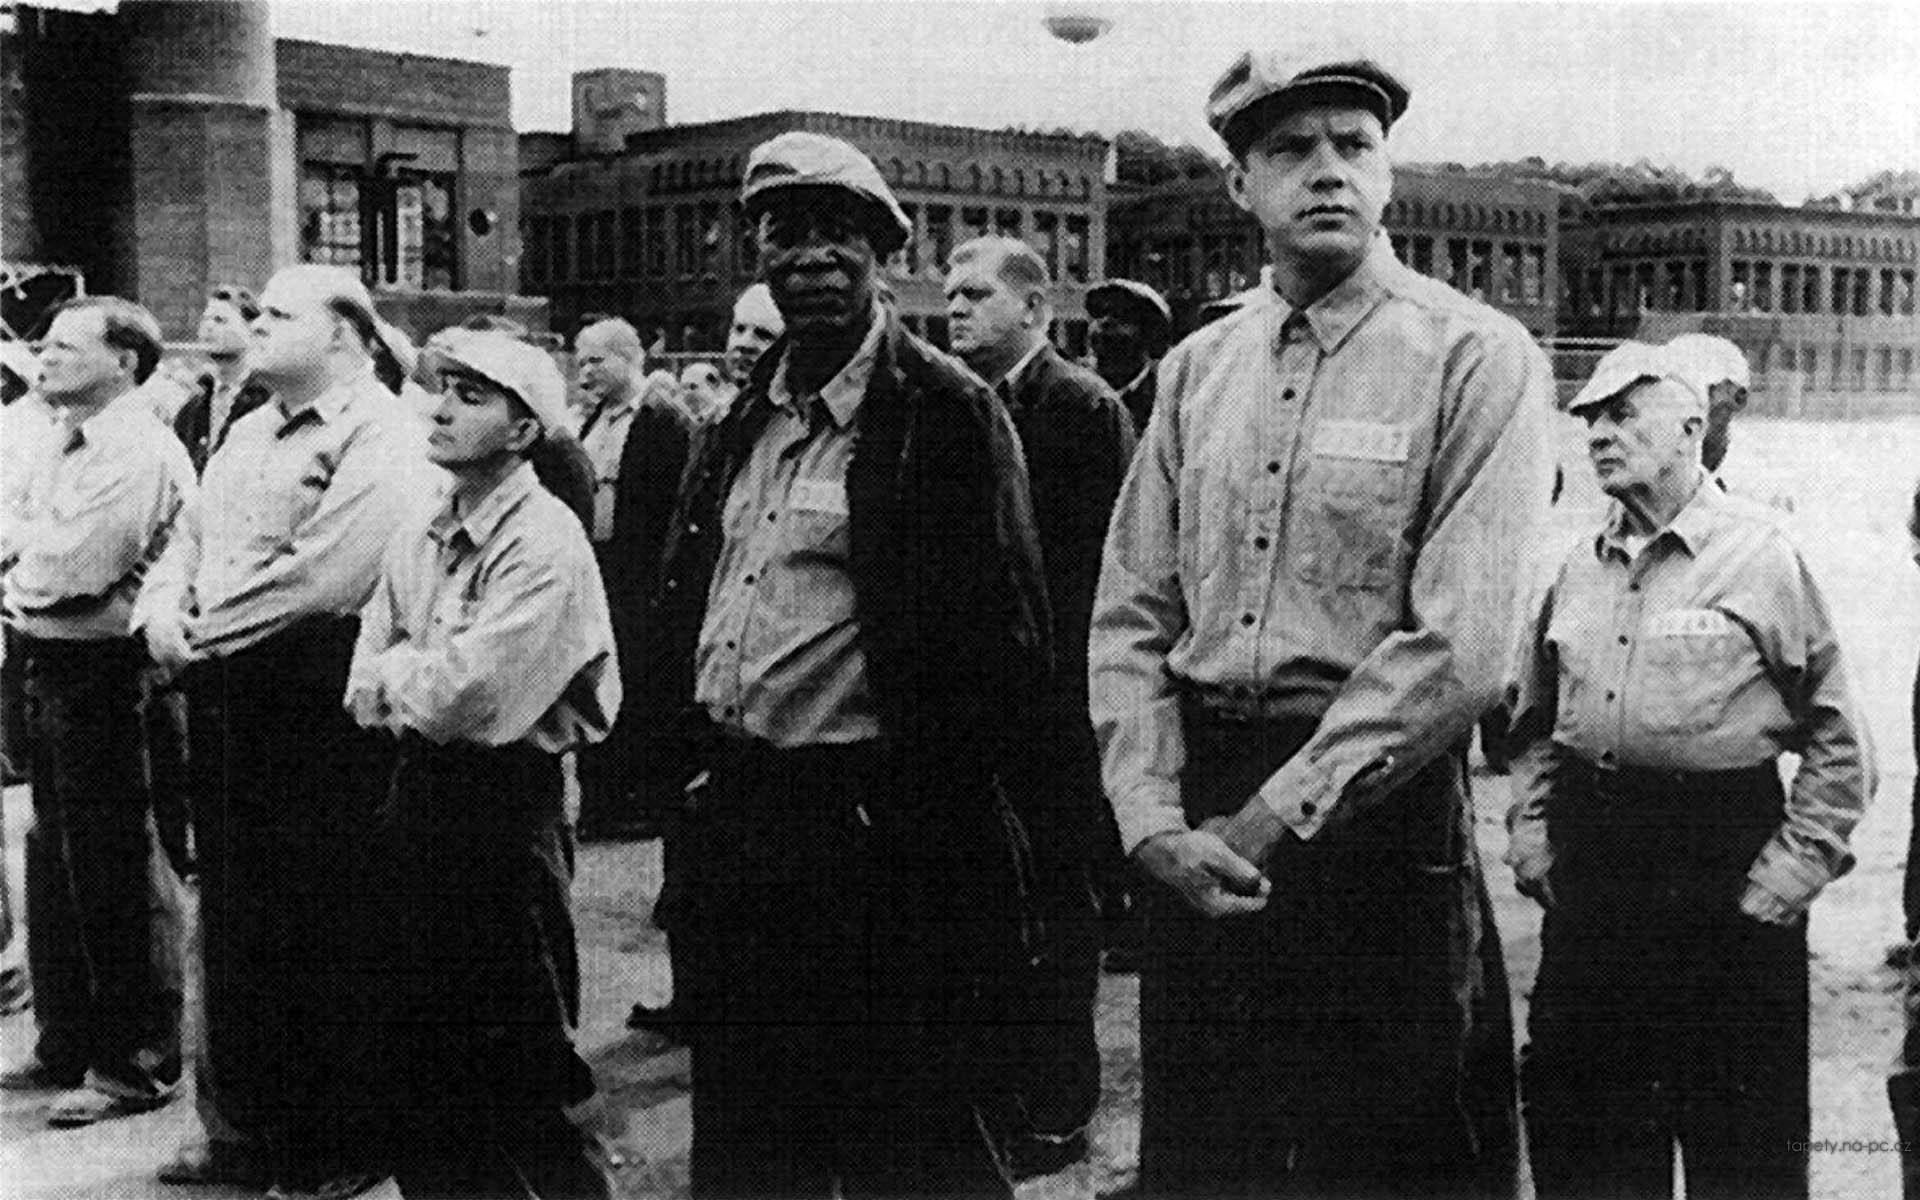 The Shawshank Redemption HD Wallpaper Background Image 1920x1200